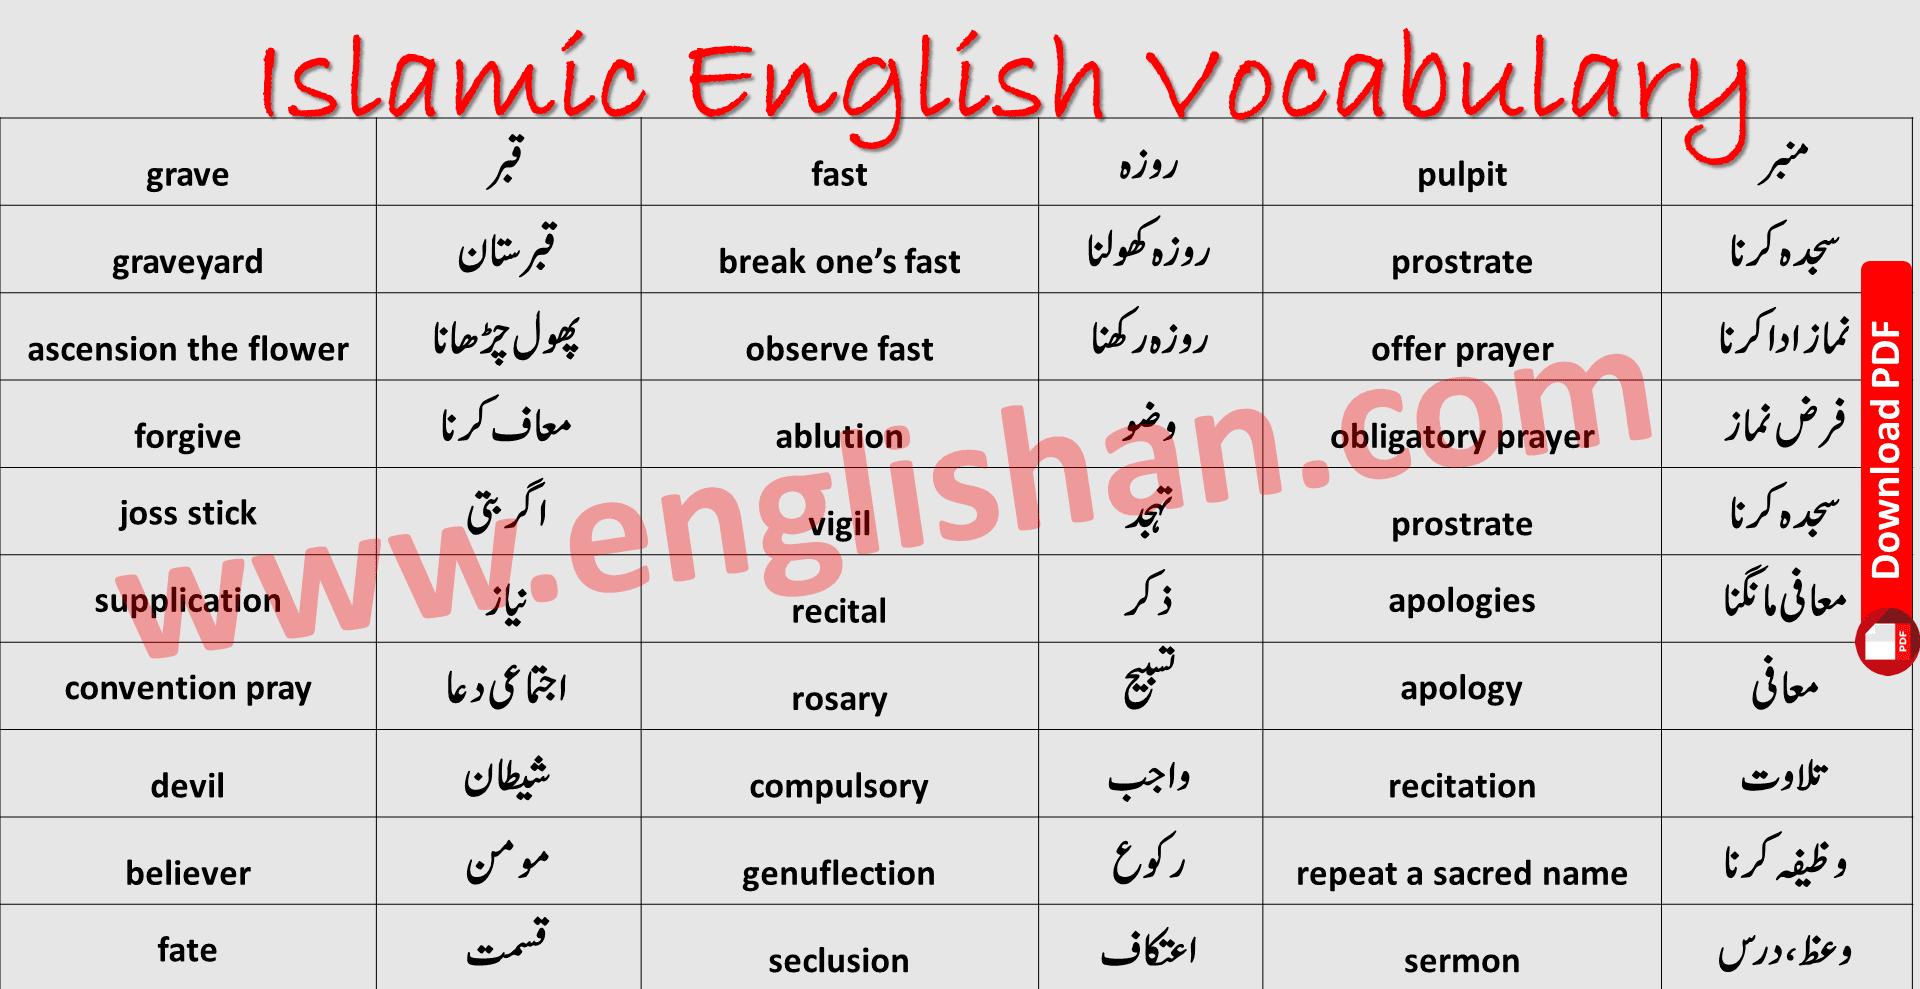 Islamic English Vocabulary